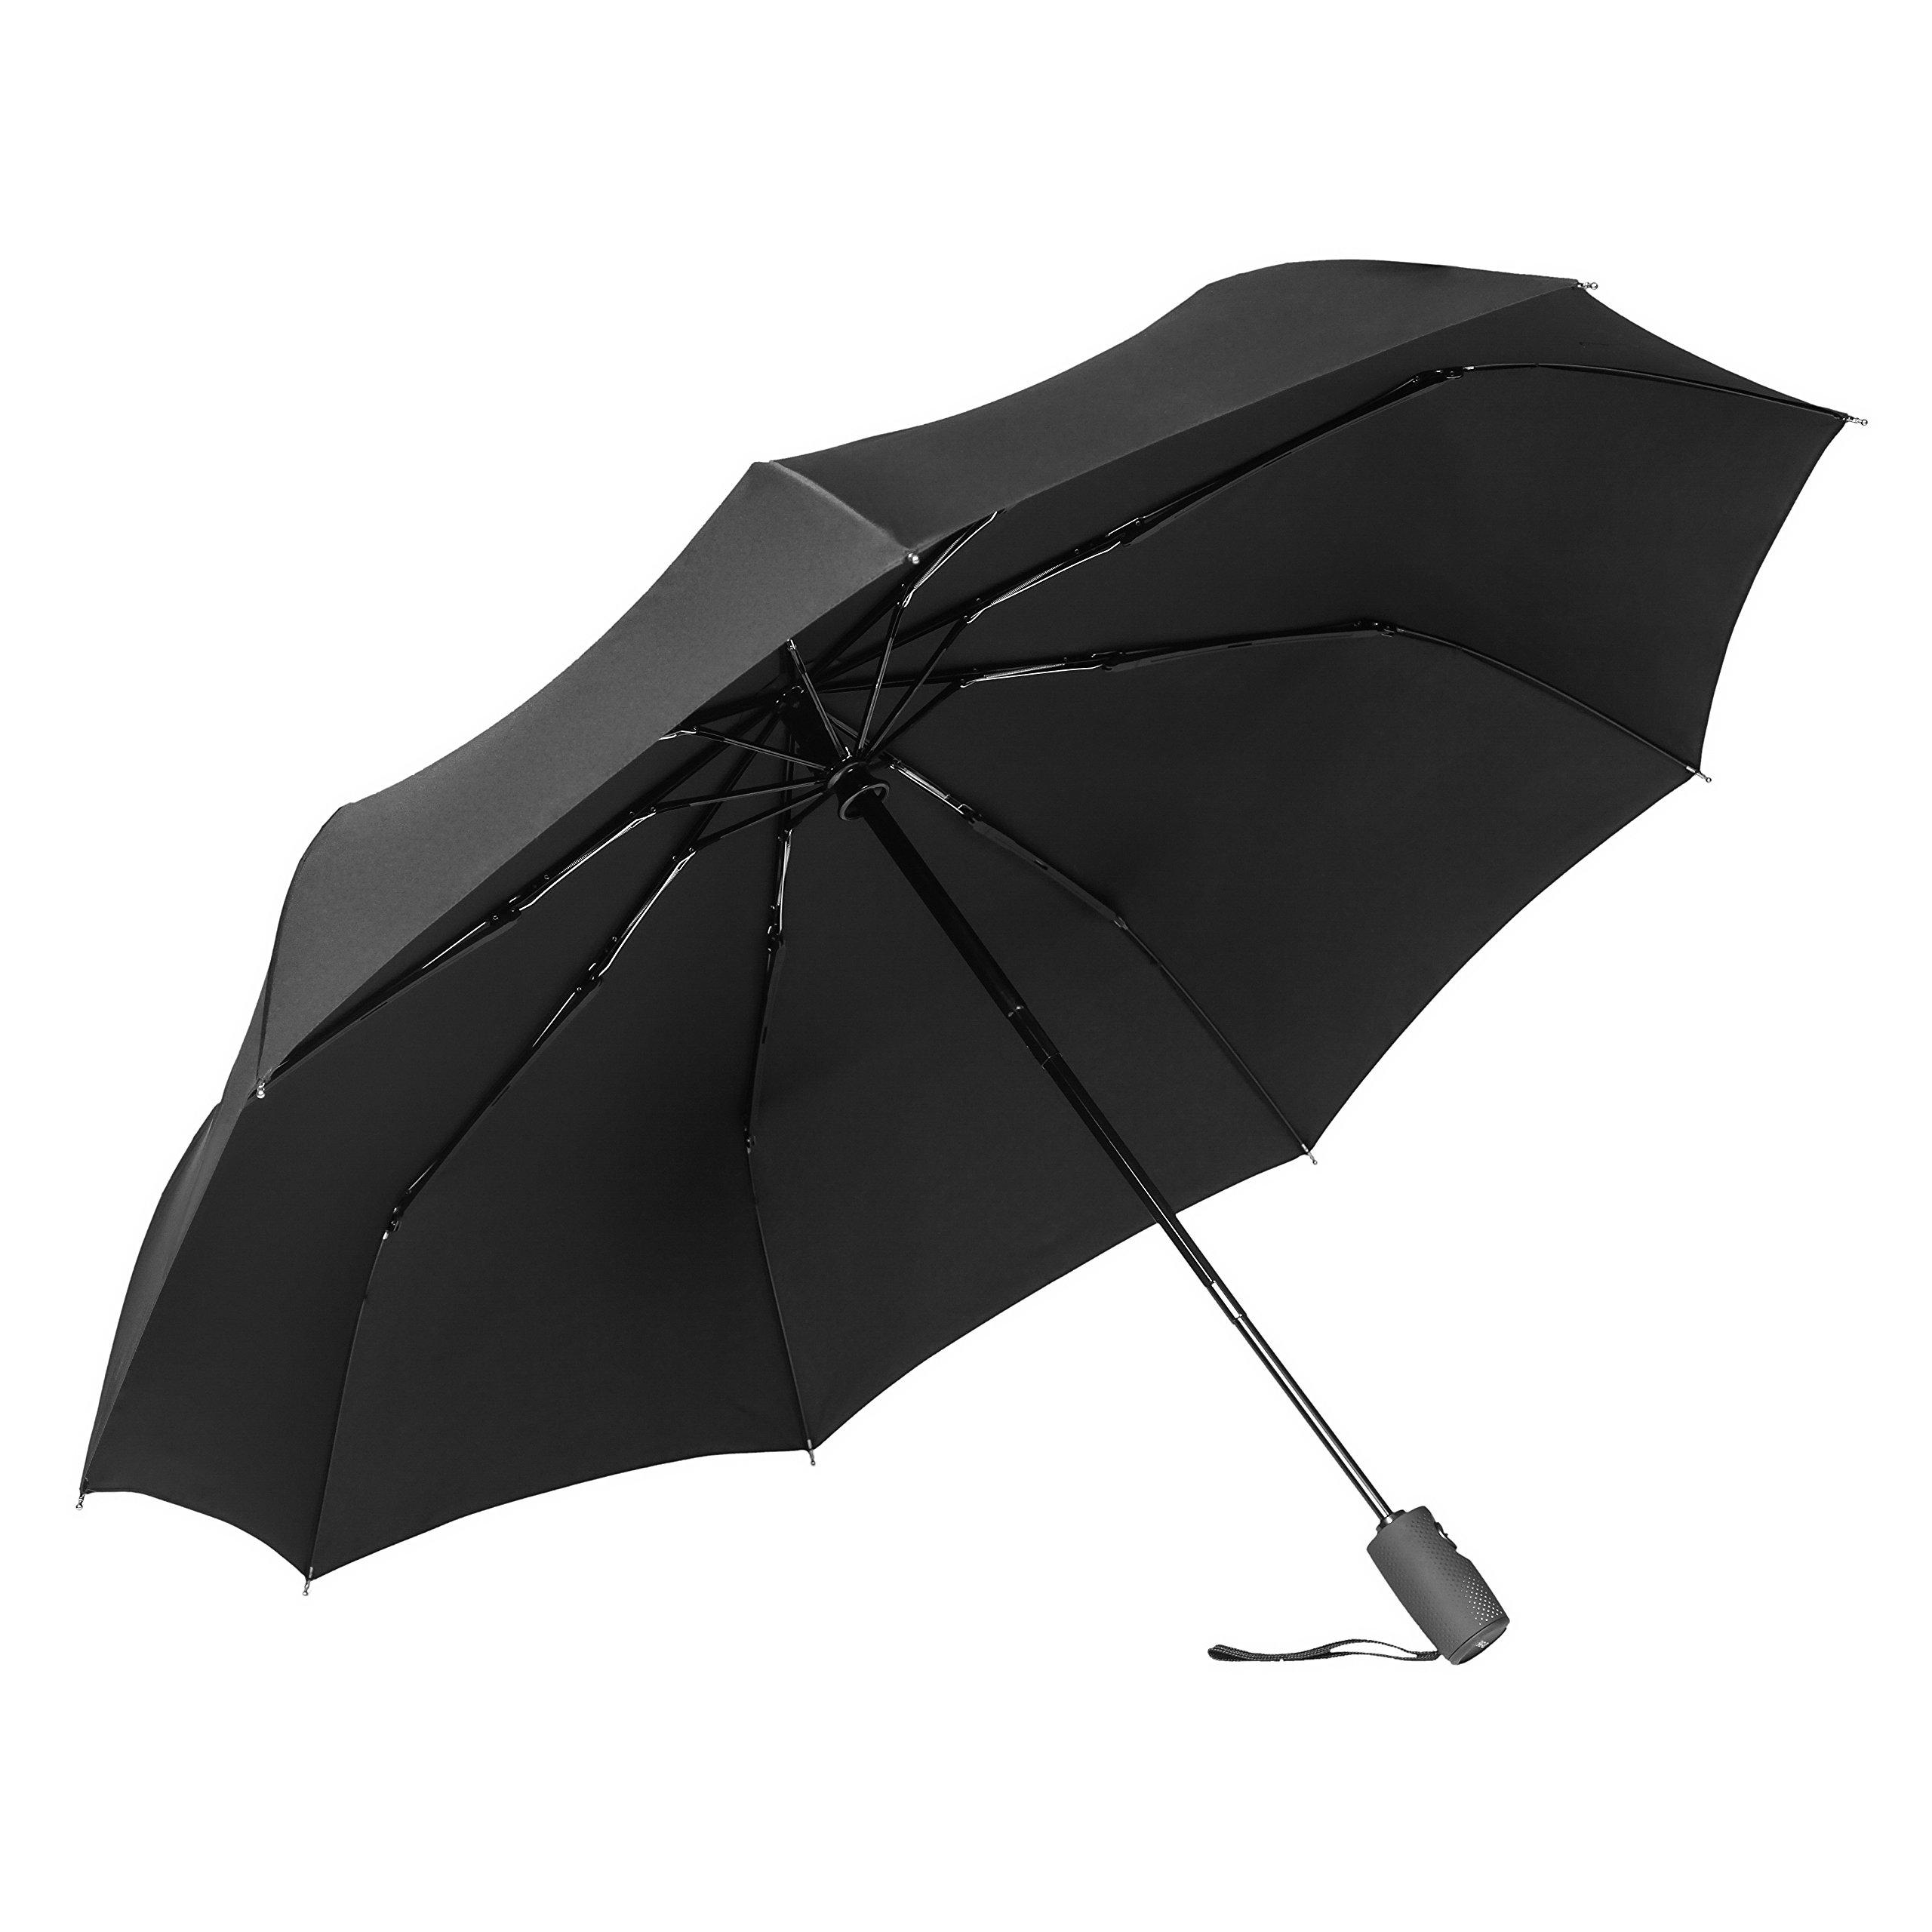 Bagail Compact Travel Umbrella Strong Durable Windproof umbrellas with Teflon Coating - Reinforced Canopy, Ergonomic Handle, Auto Open/Close Black